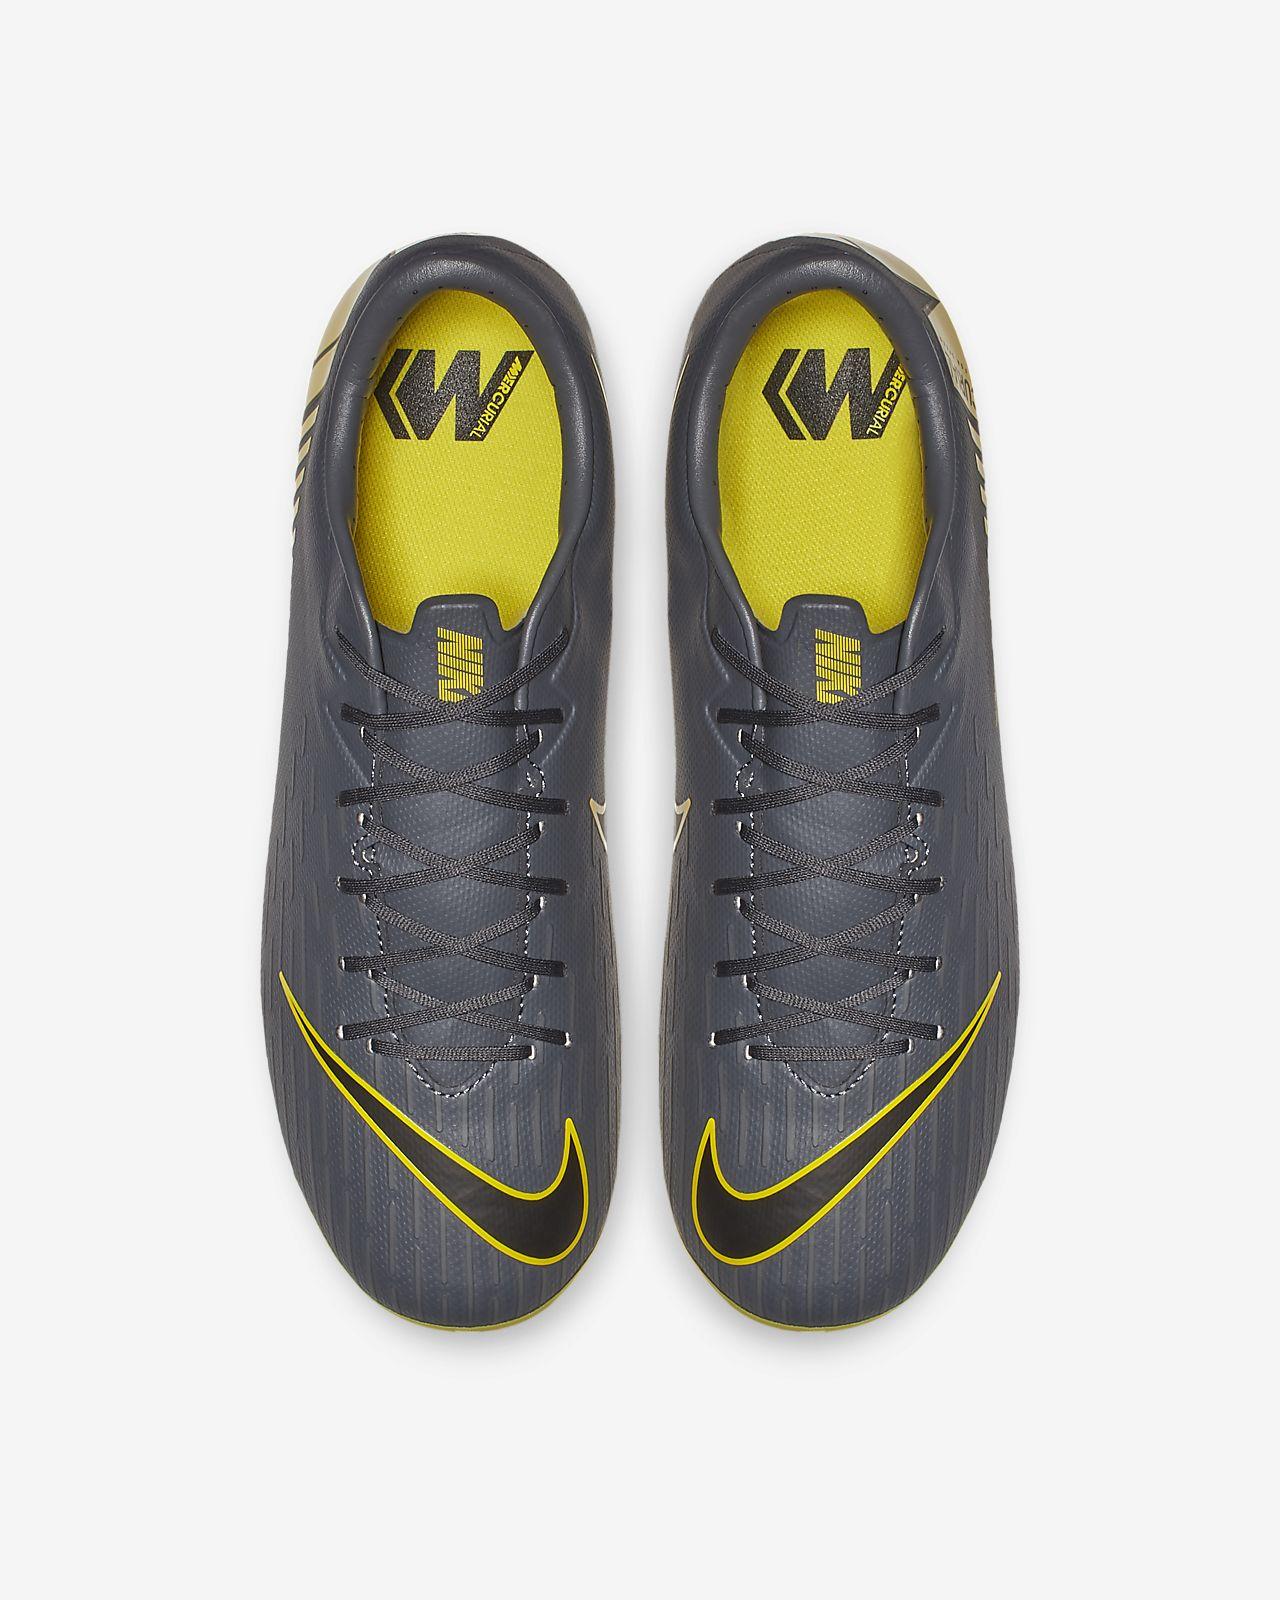 b2ca89d6095d Nike Vapor 12 Academy MG Multi-Ground Soccer Cleat. Nike.com